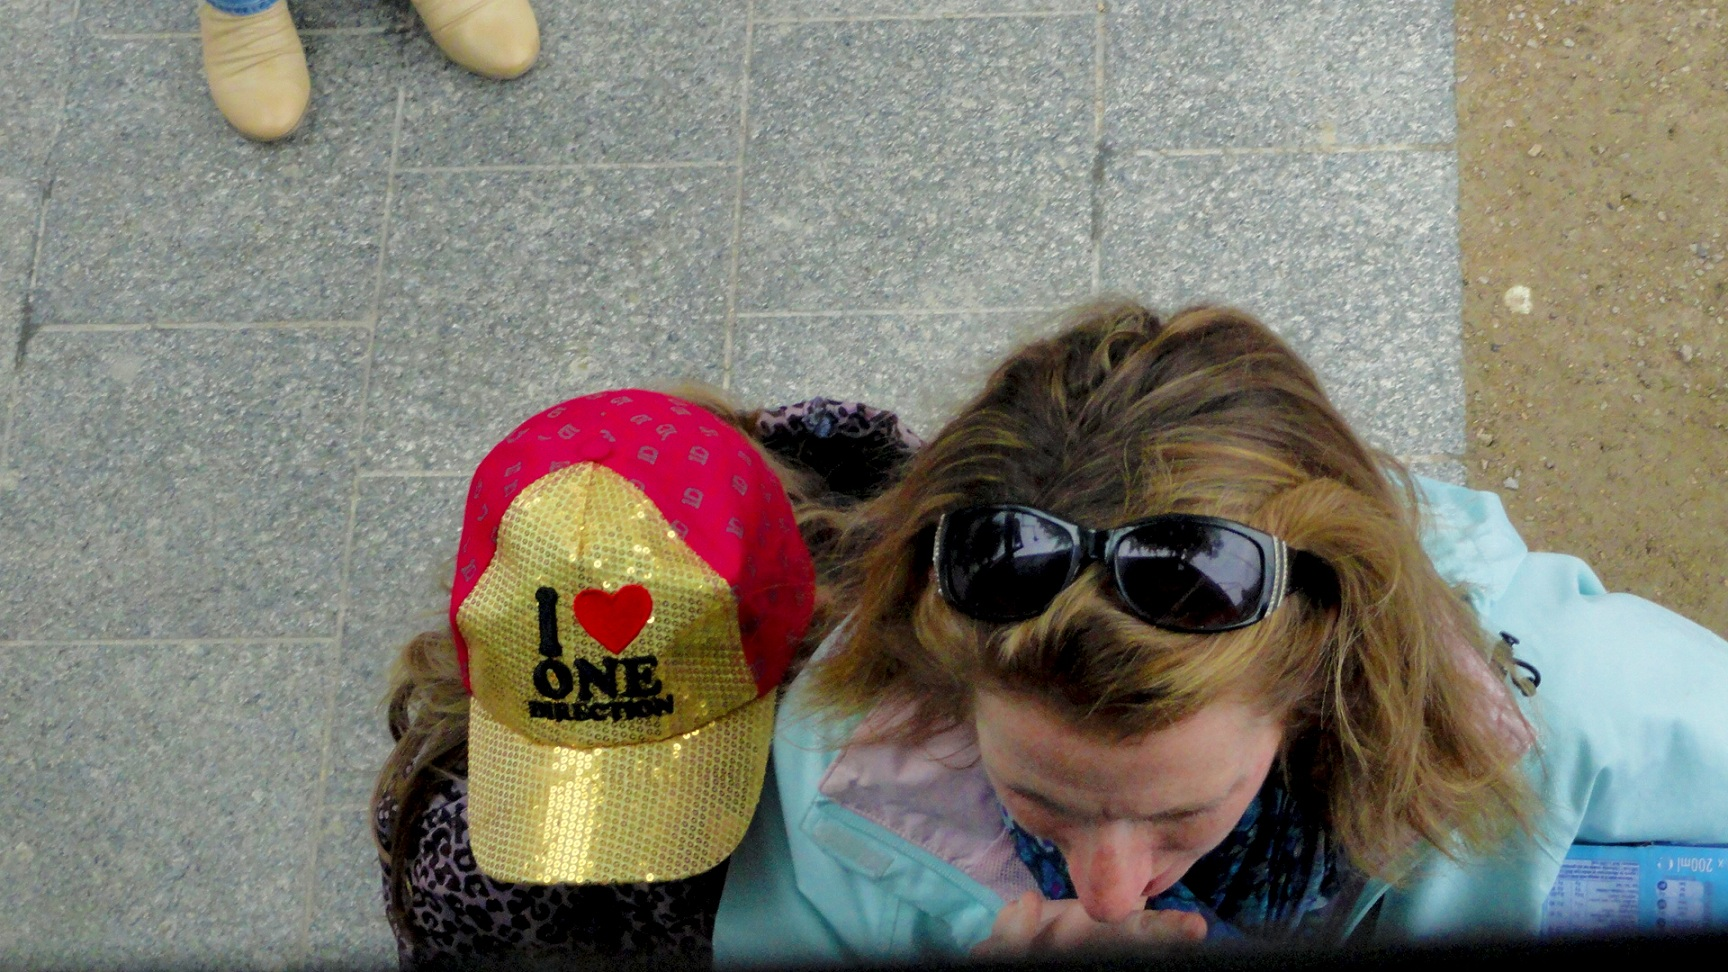 Dublin - One Direction